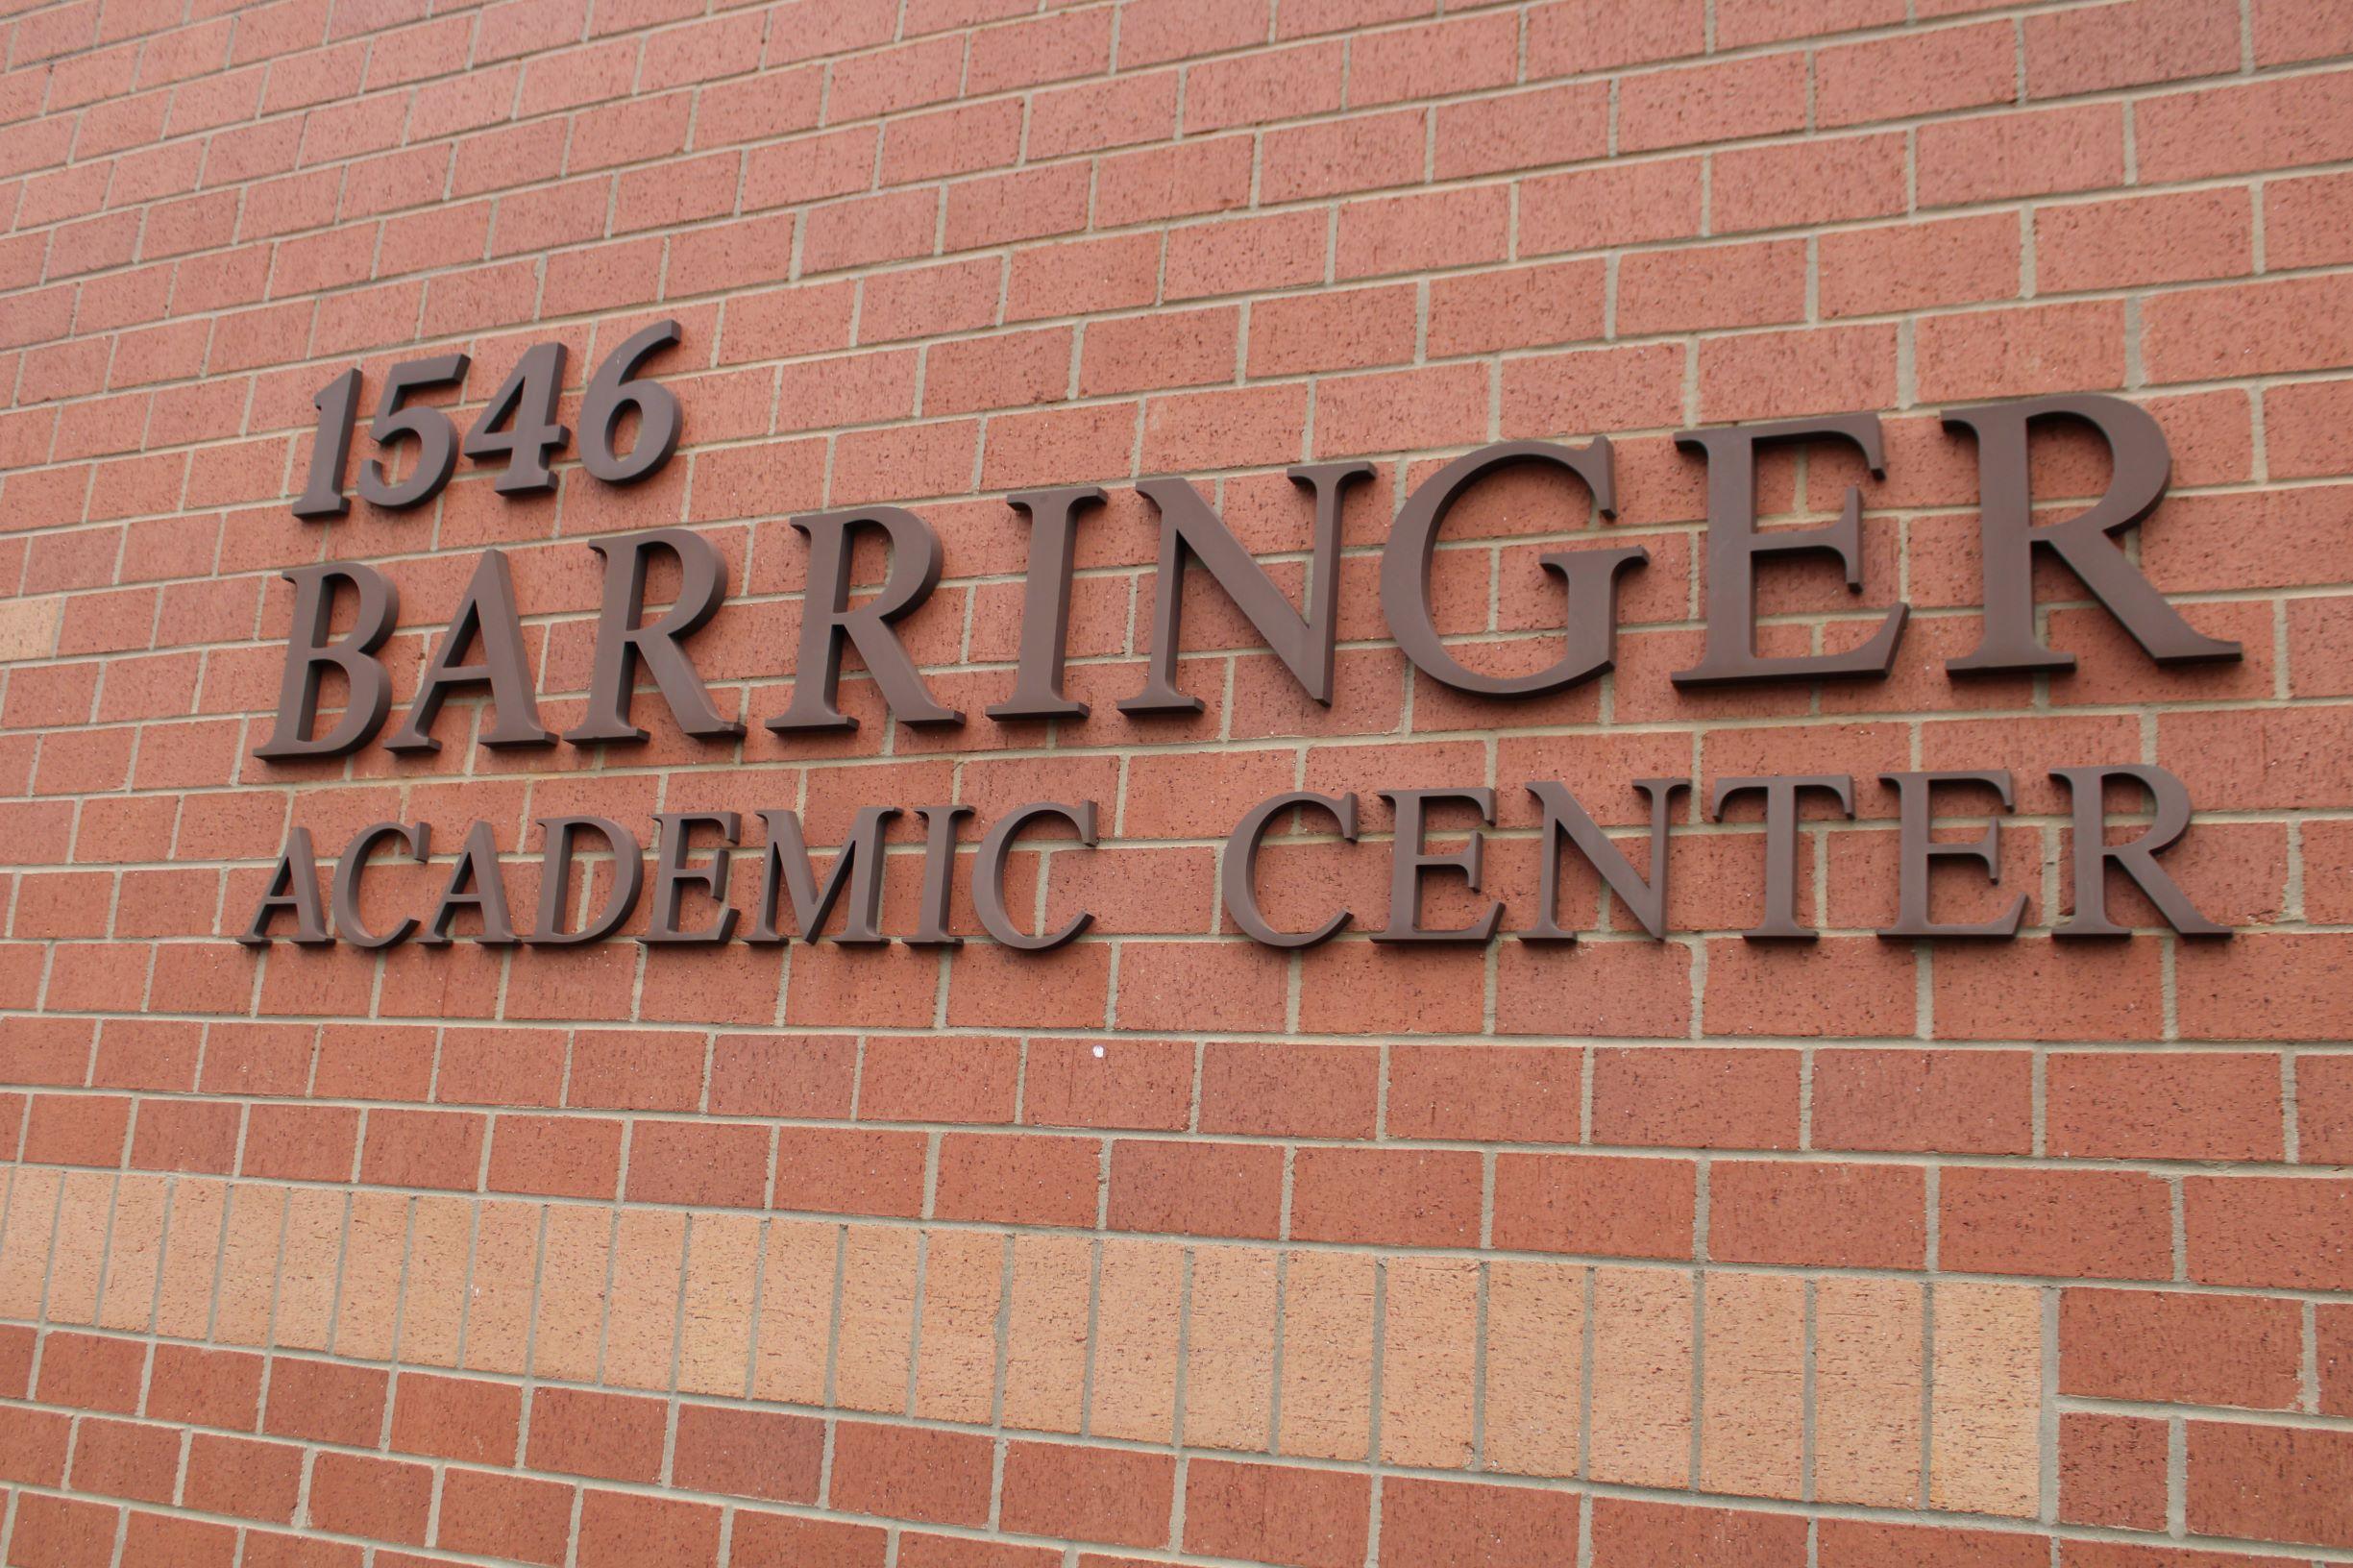 Barringer-Academic-Center-signage